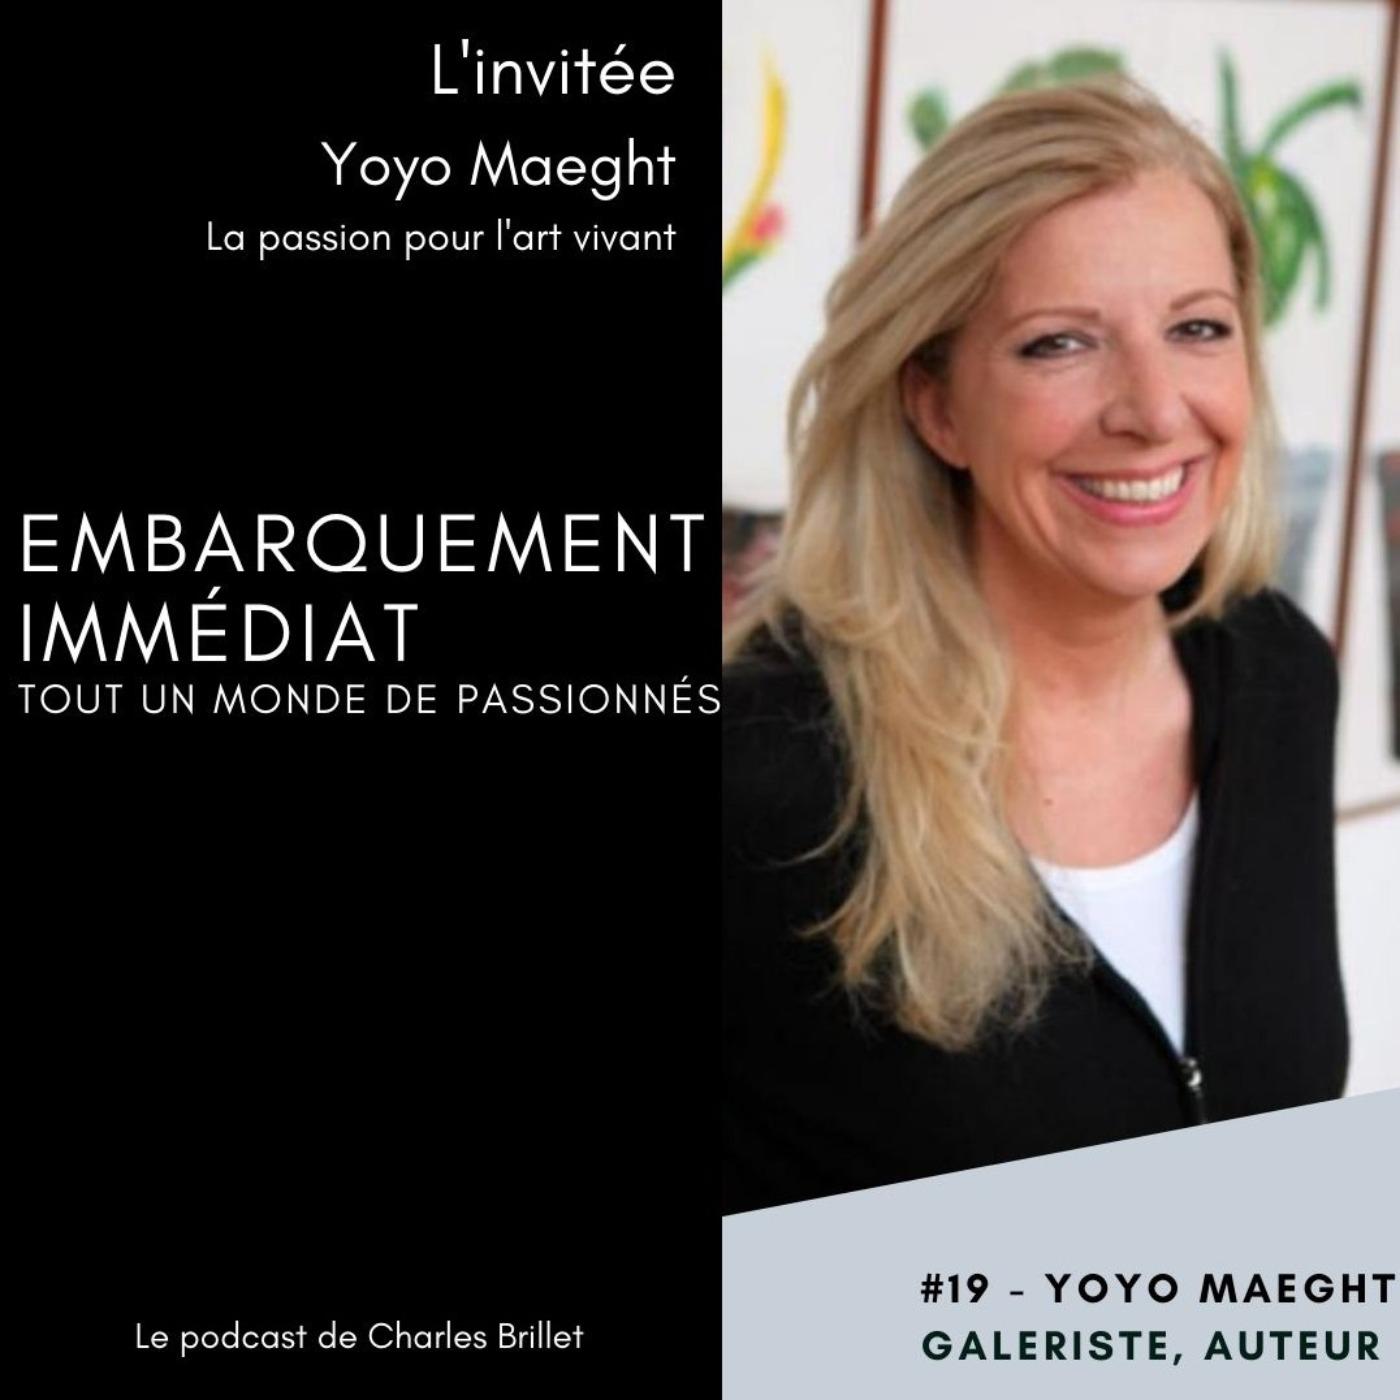 #19 - Yoyo Maeght - La passion de l'art vivant - St Paul de Vence